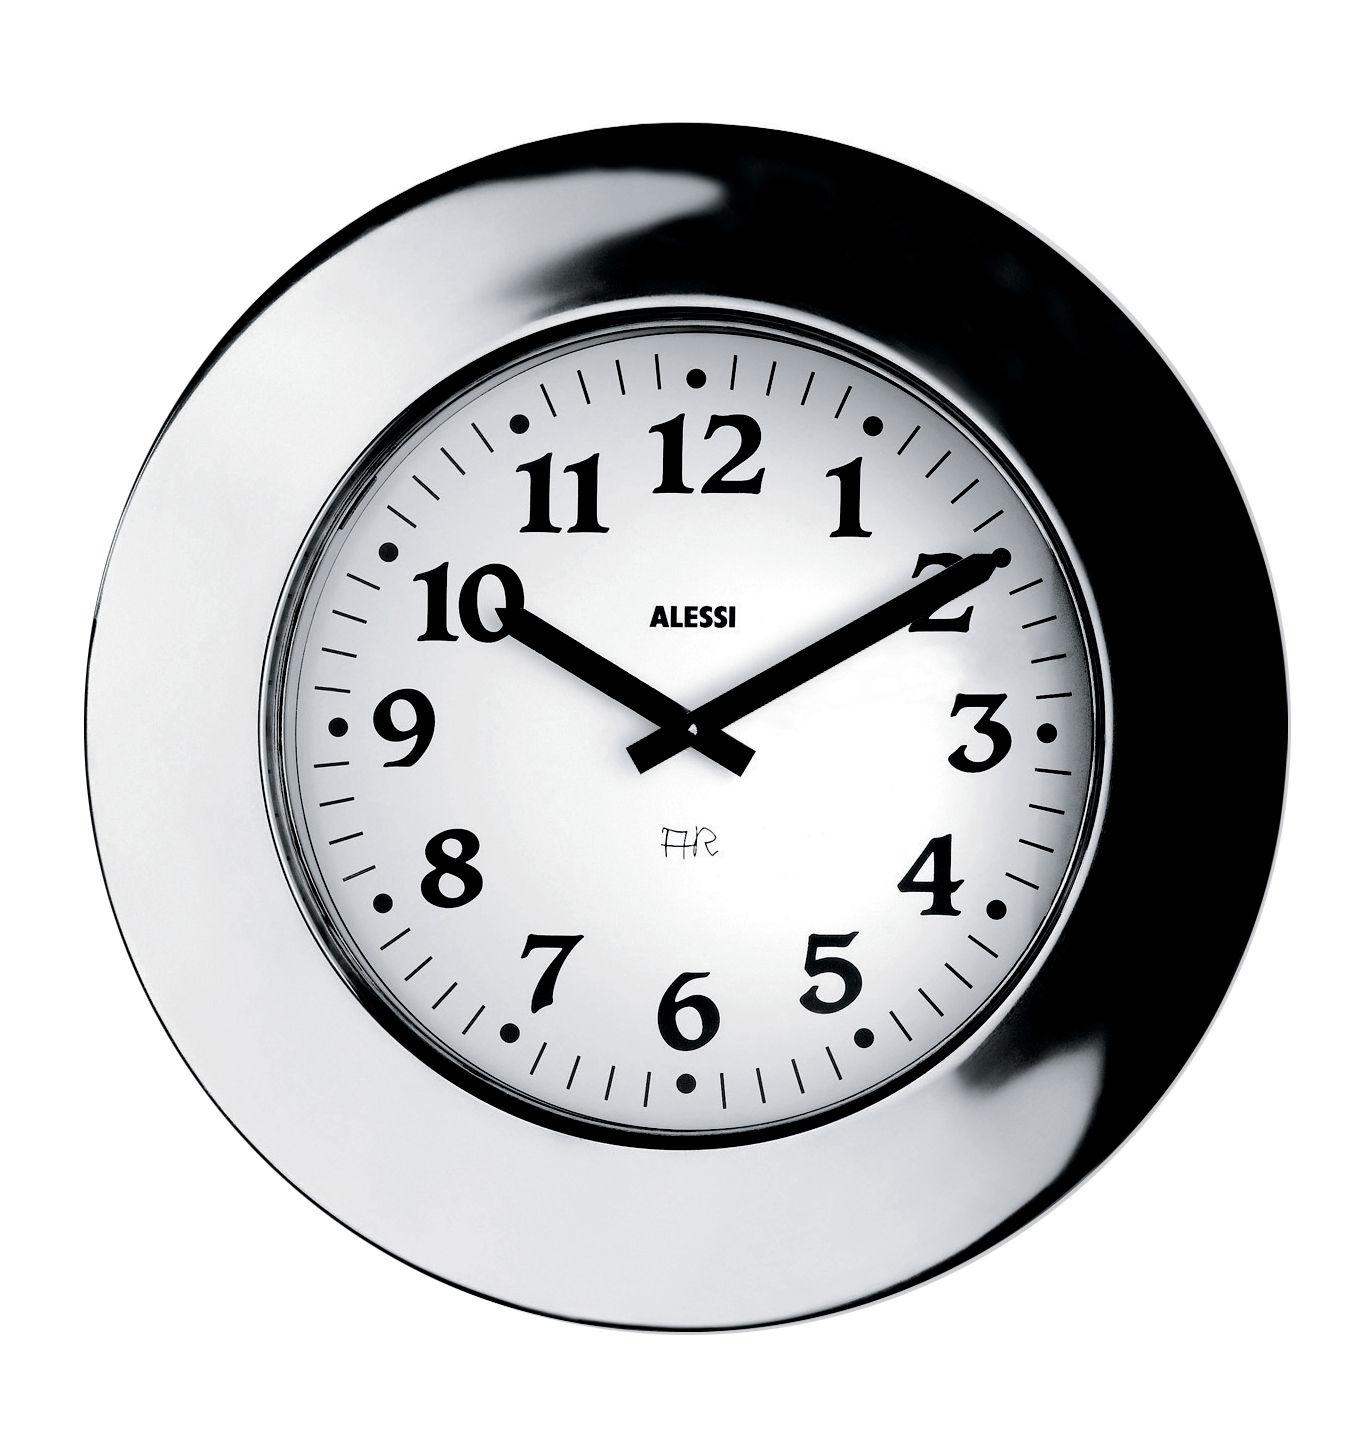 Dekoration - Uhren - Momento Wanduhr - Alessi - Stahl - rostfreier Stahl